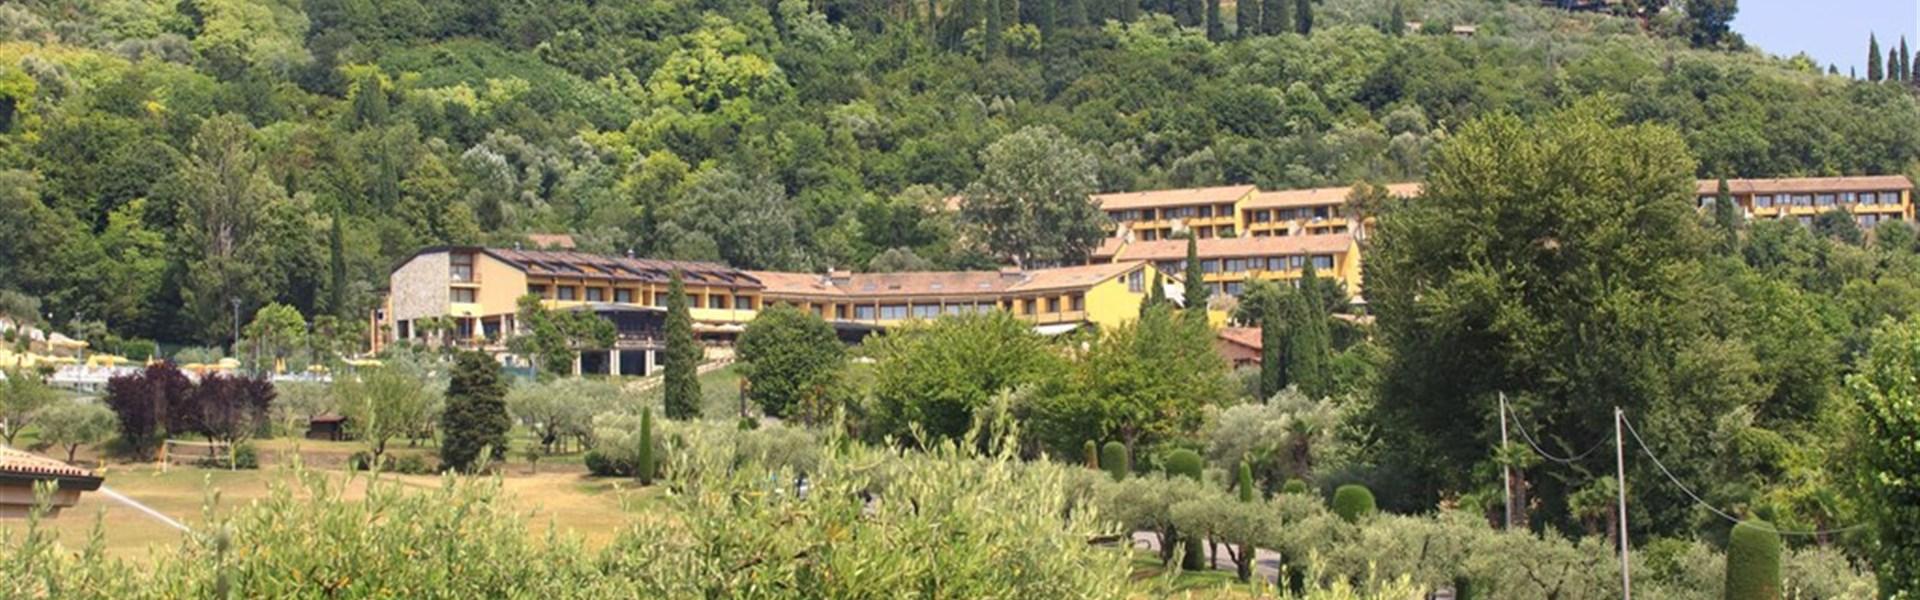 Poiano Resort Hotel -